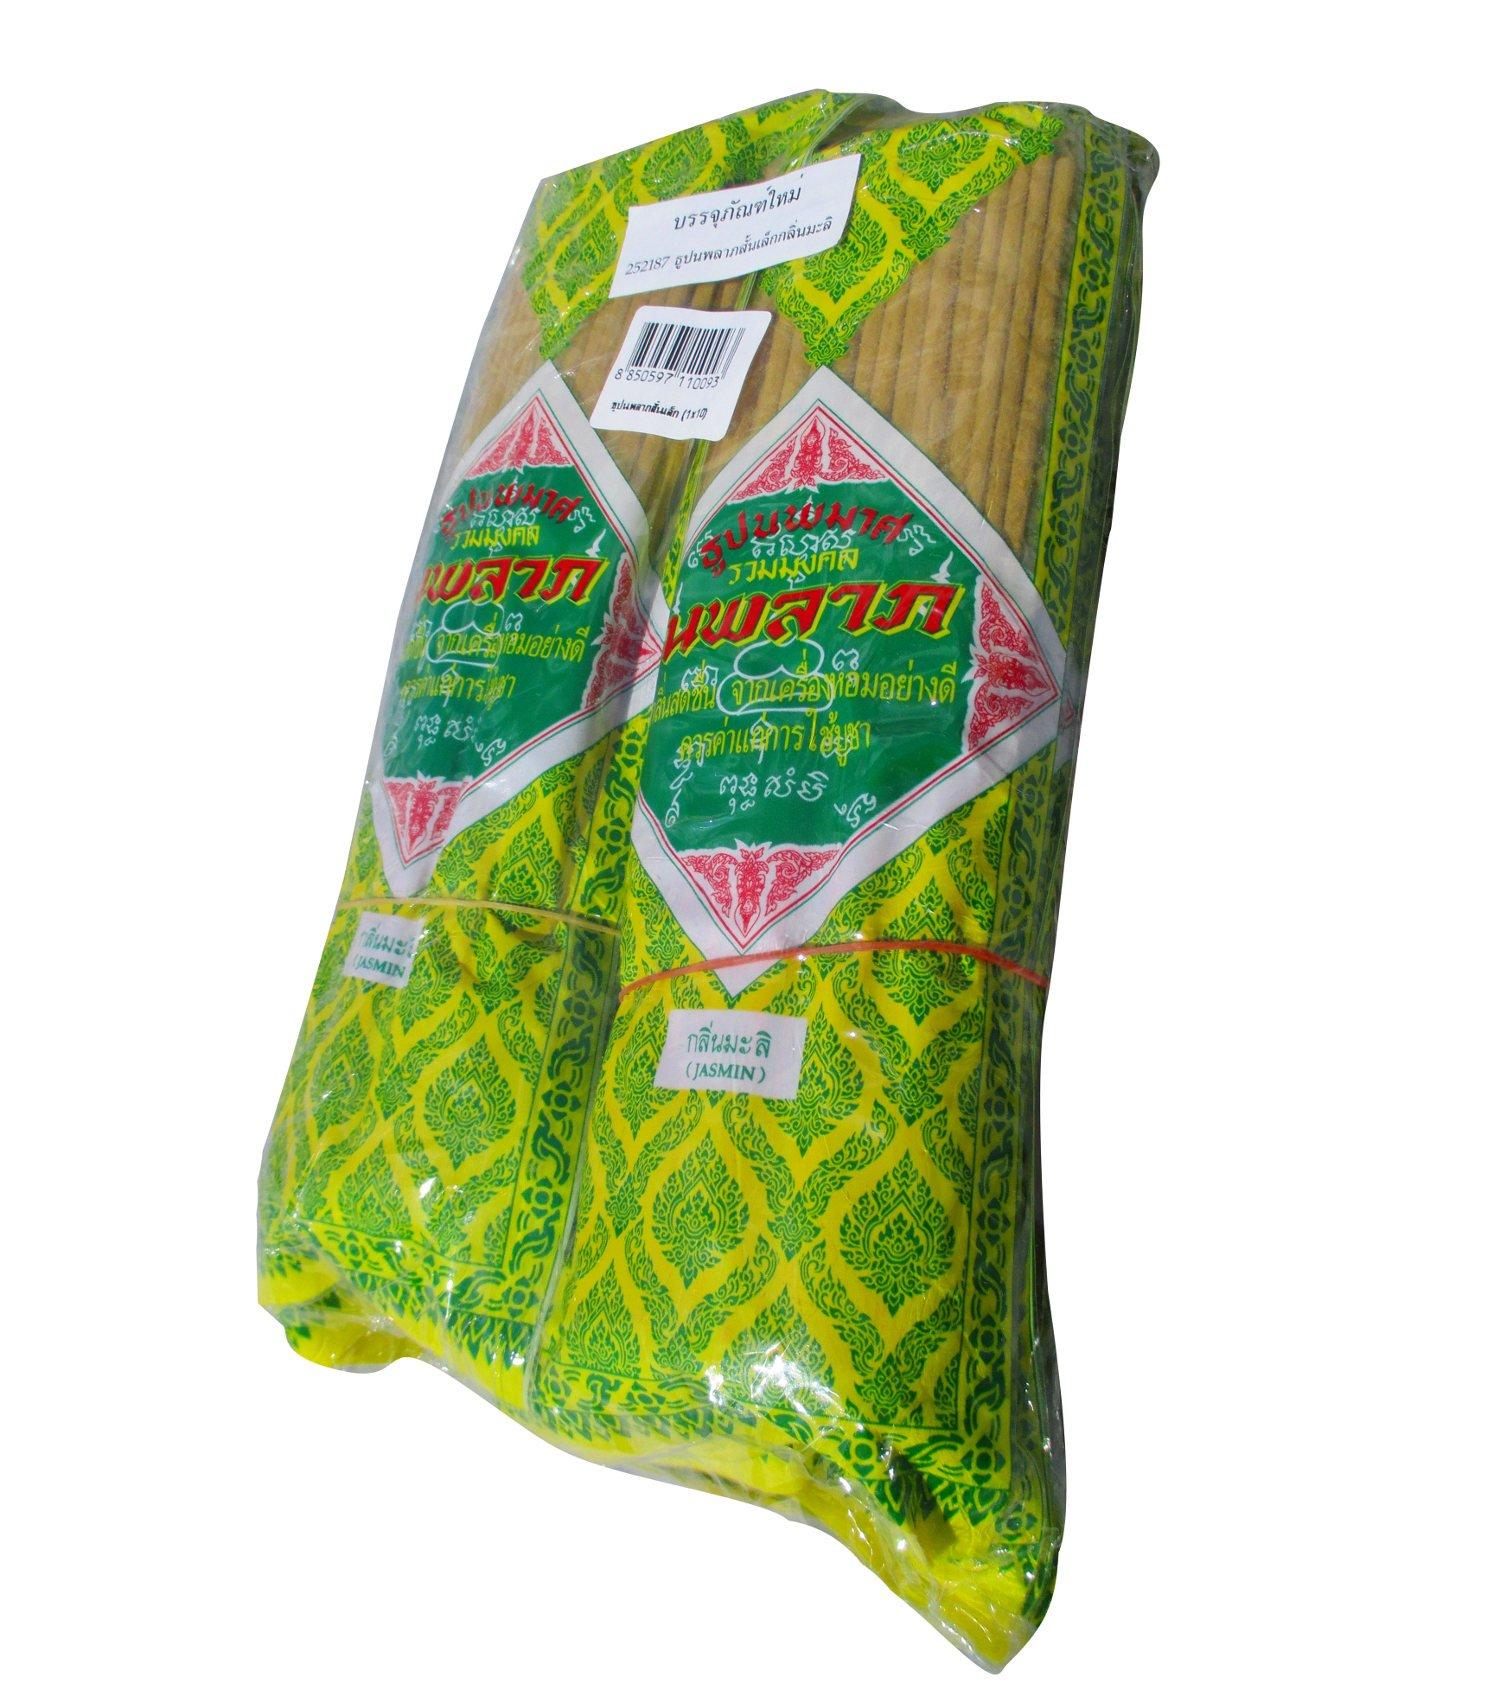 Full Funk Thai Bhuddhist Jasmine Scented Incense Joss Sticks 13''x 500pcs